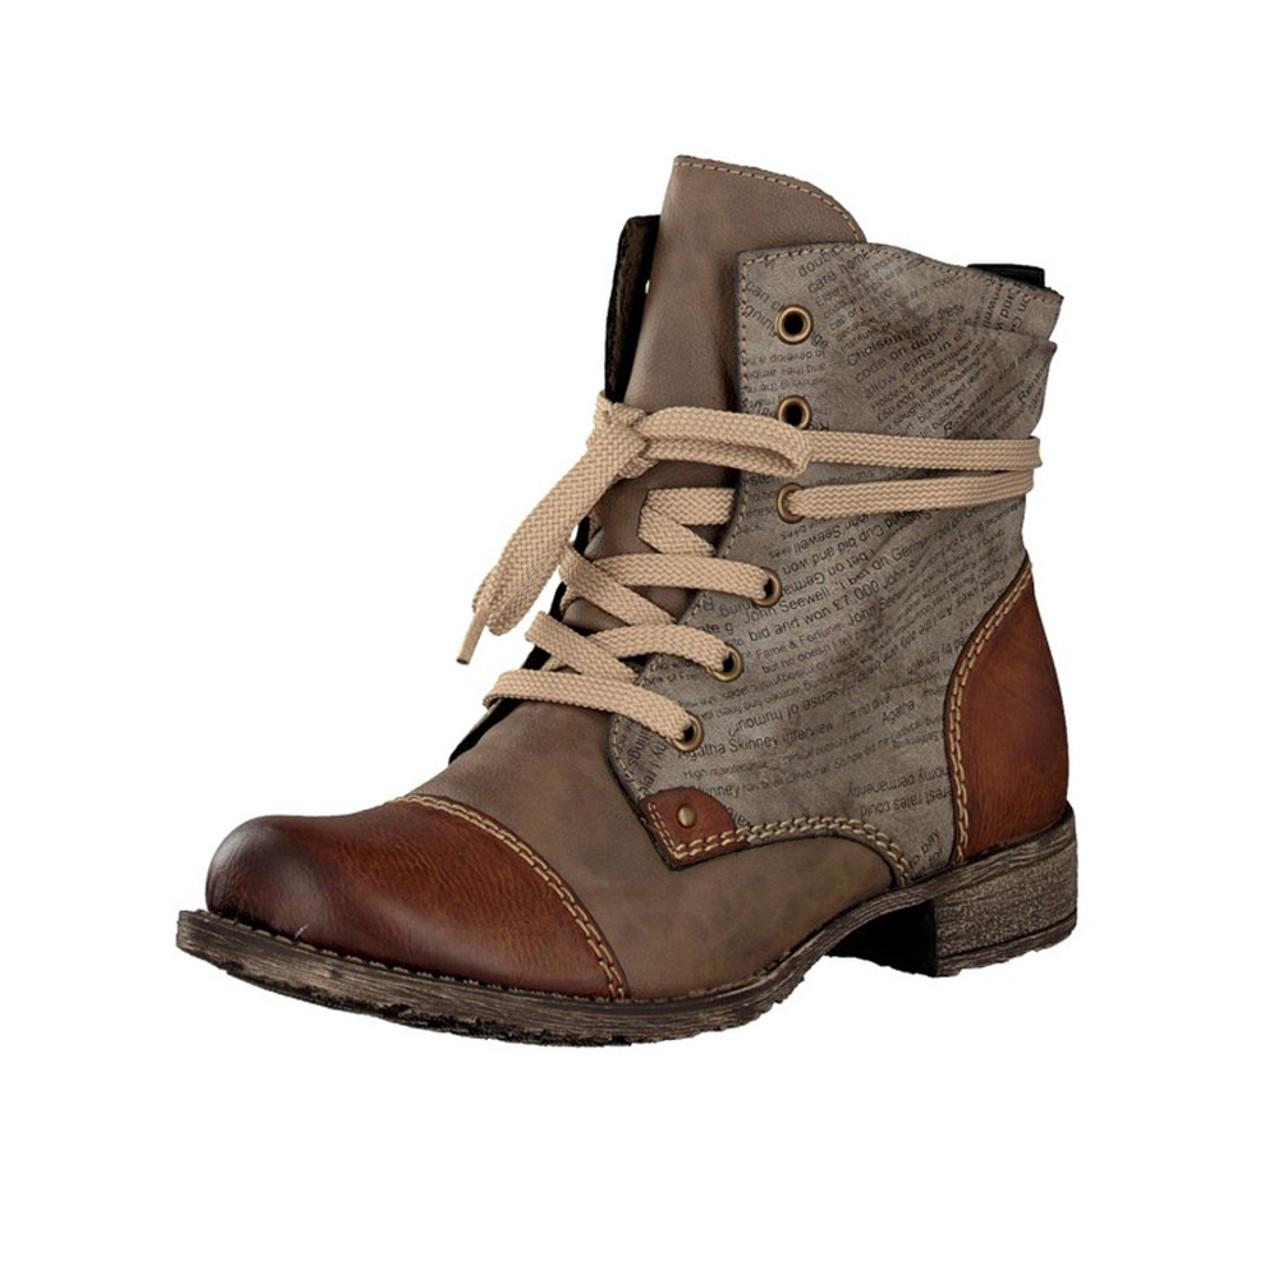 Discount Rieker Ladies Boots \u0026 More